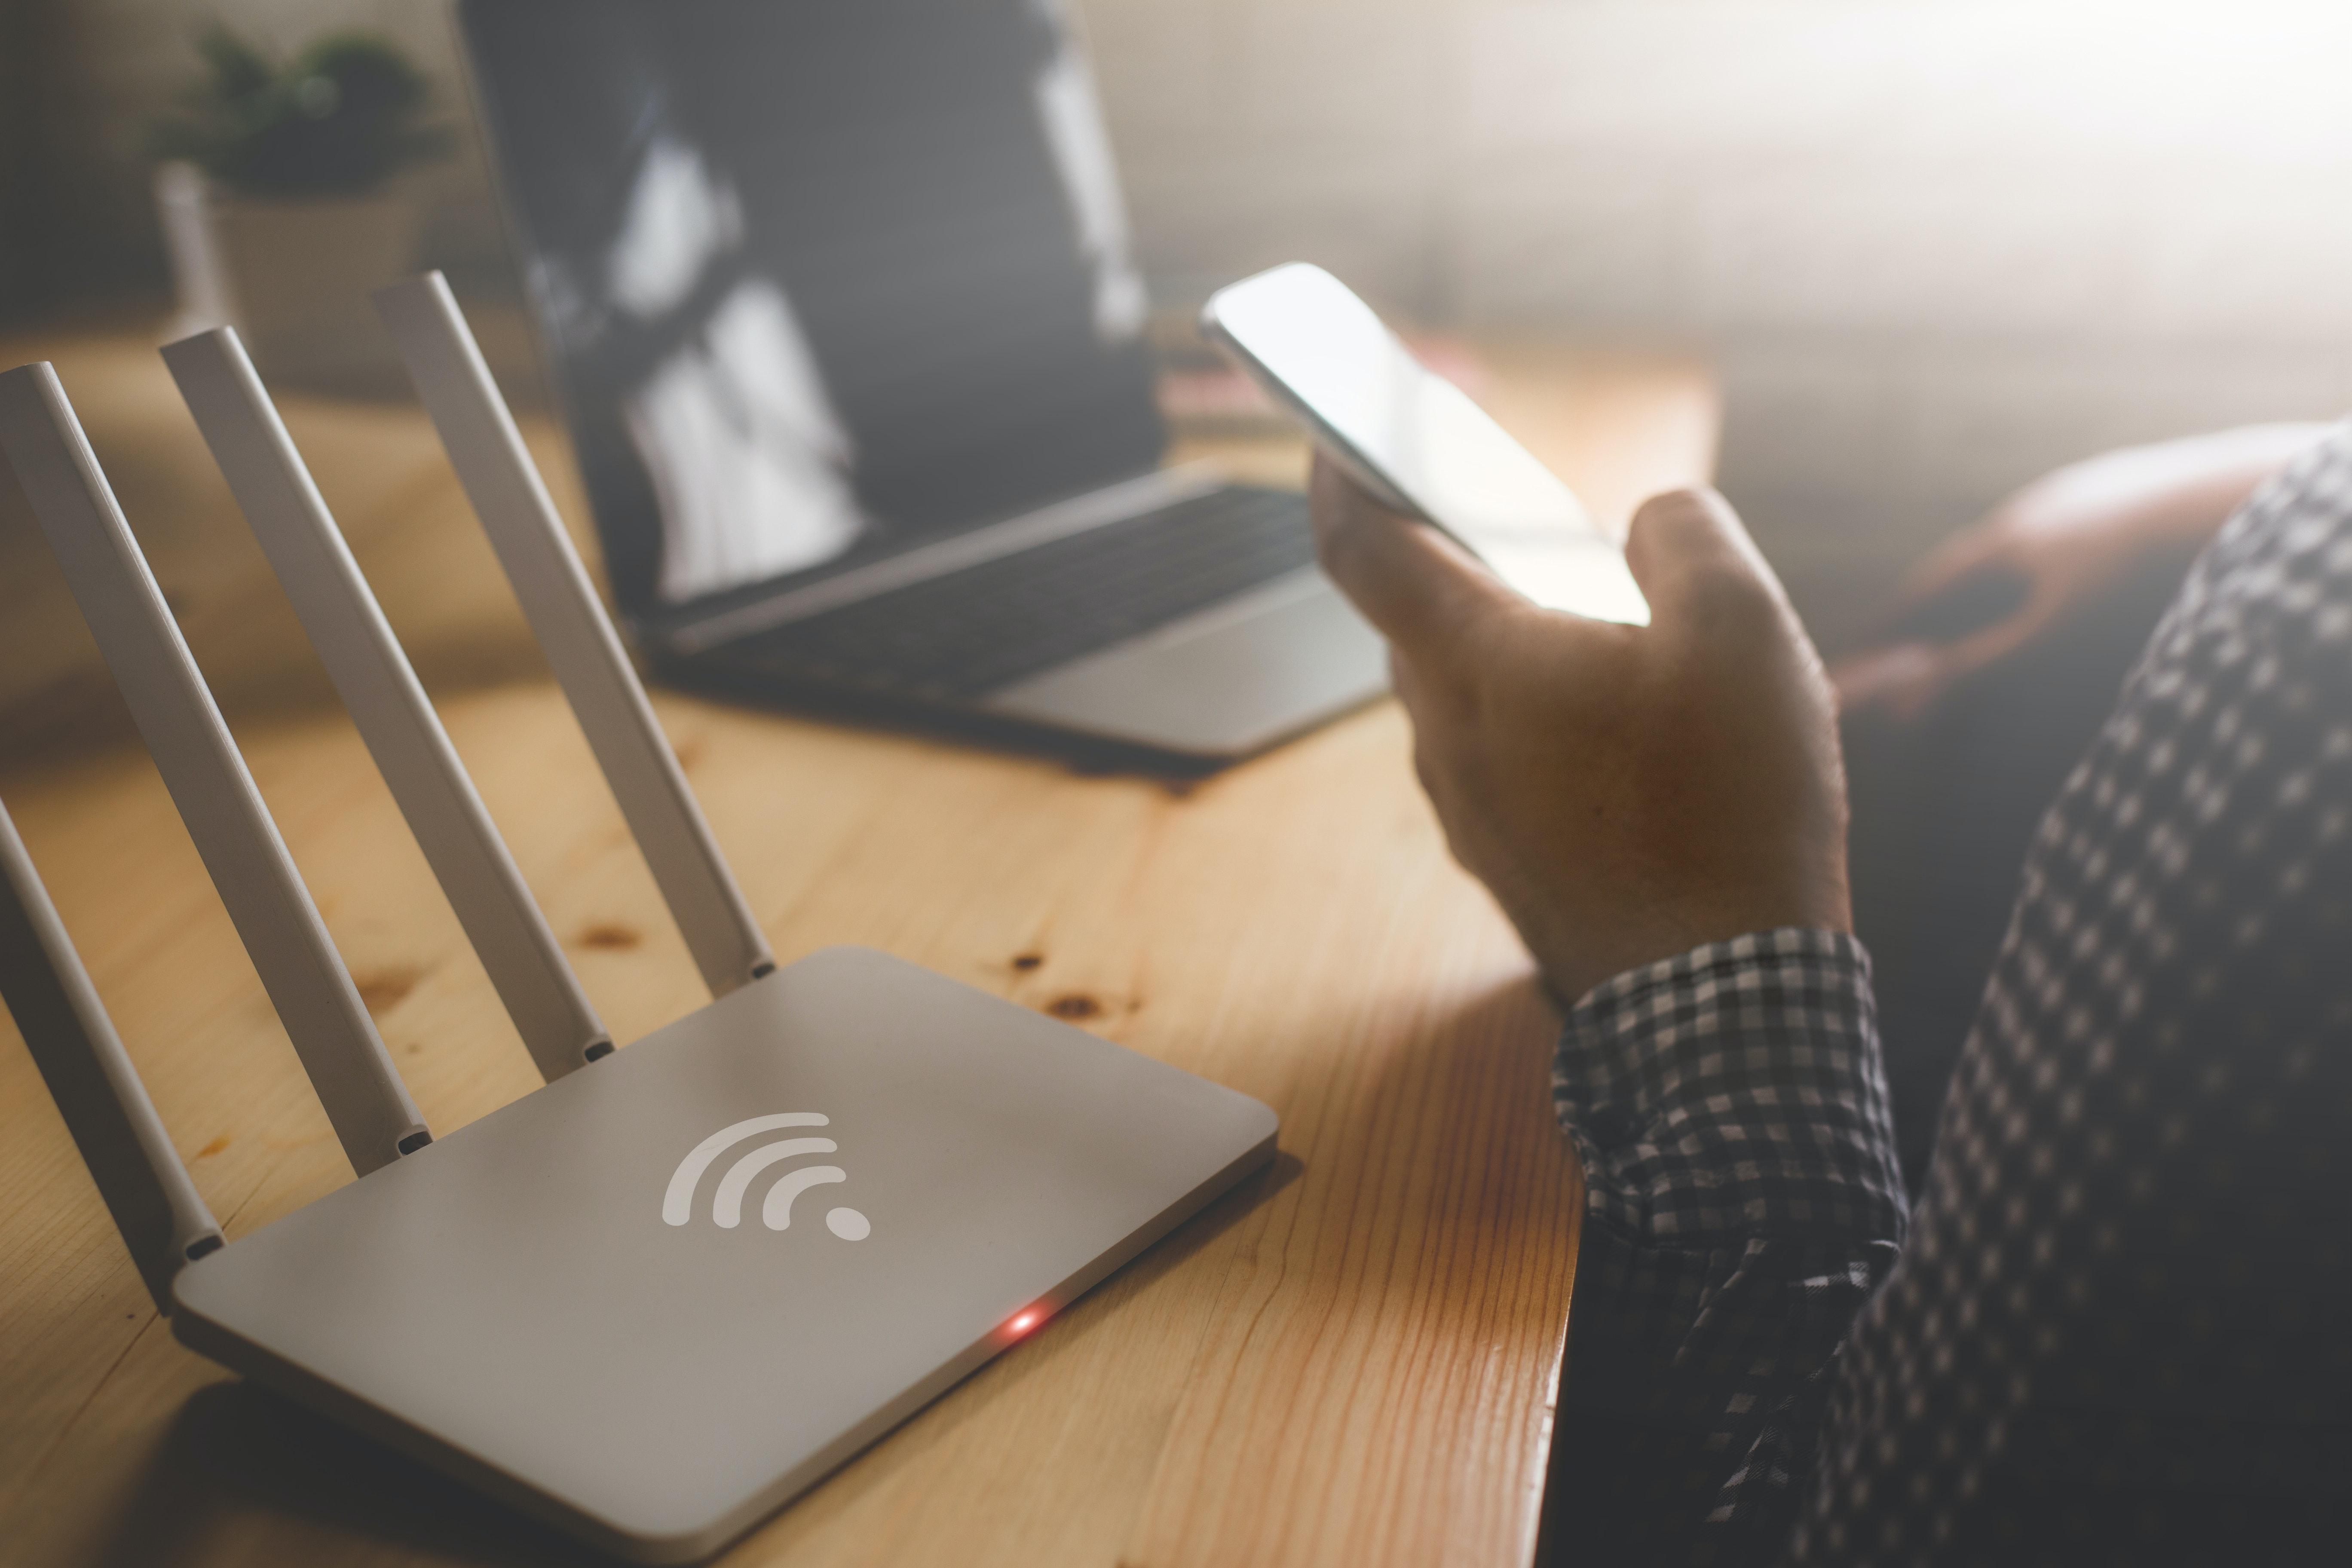 Superfast broadband router